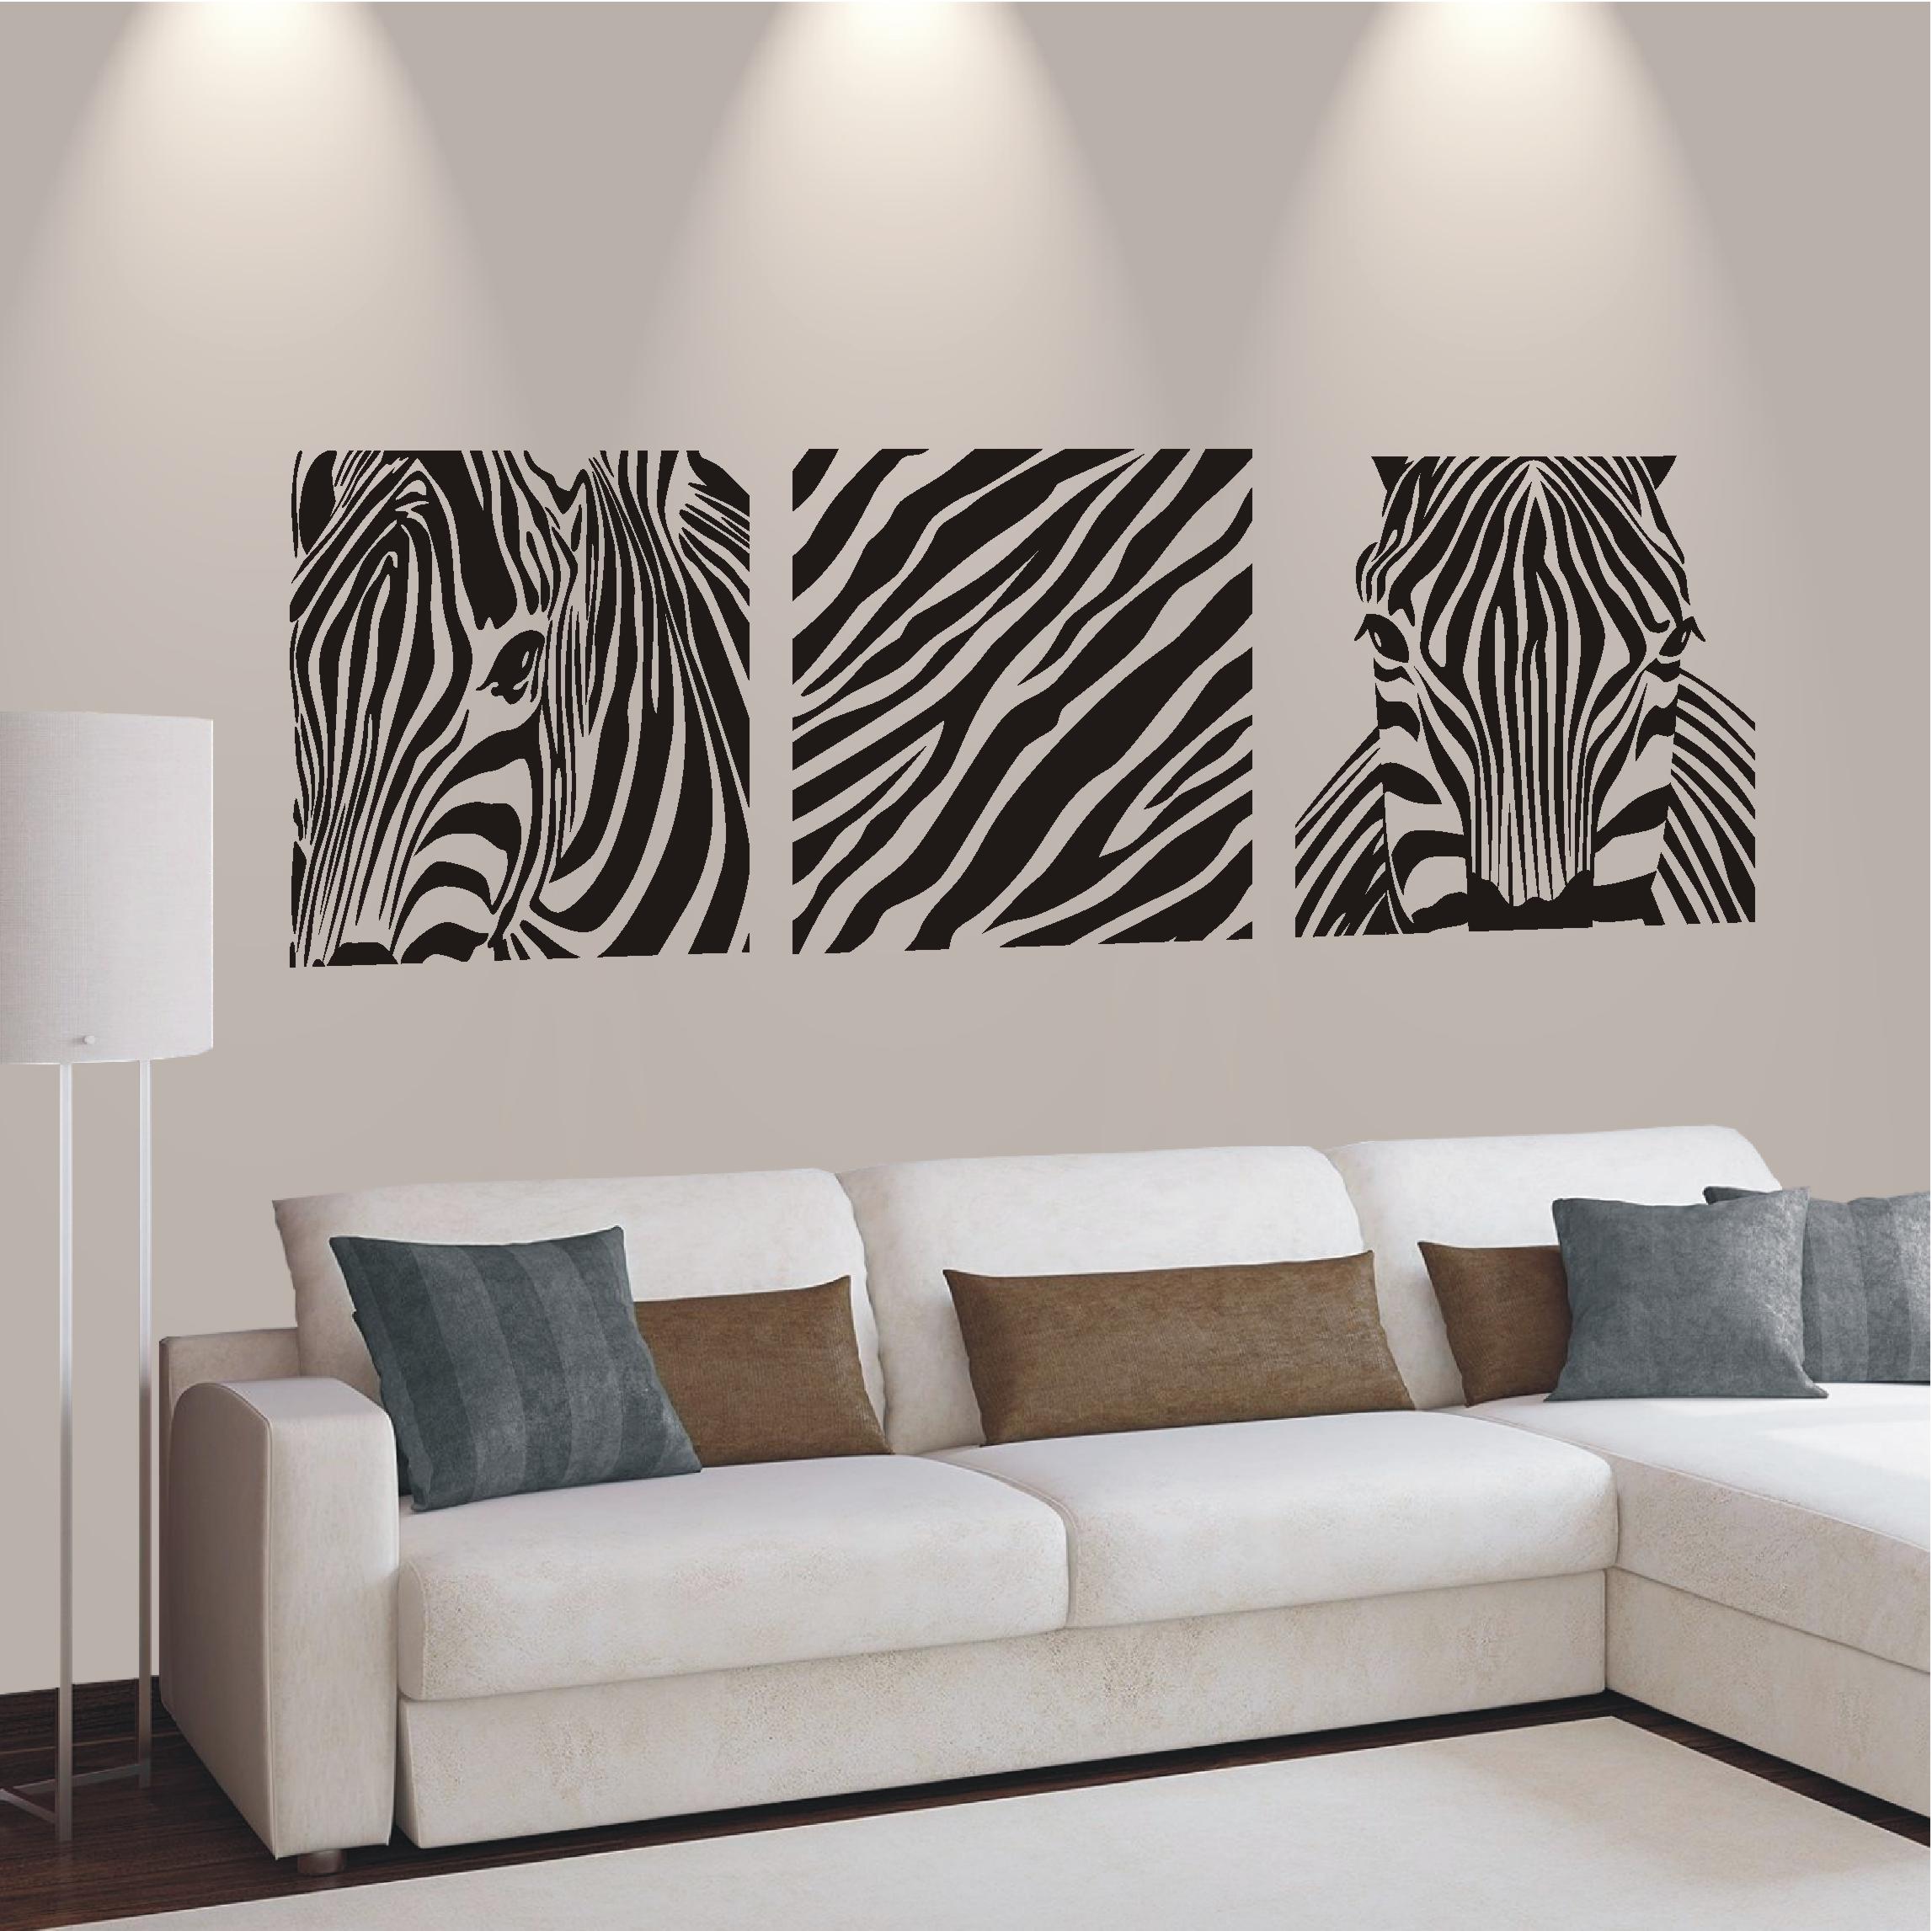 wandtattoo banner zebra safari animal afrika wohnzimmer flur neu motiv 607 ebay. Black Bedroom Furniture Sets. Home Design Ideas